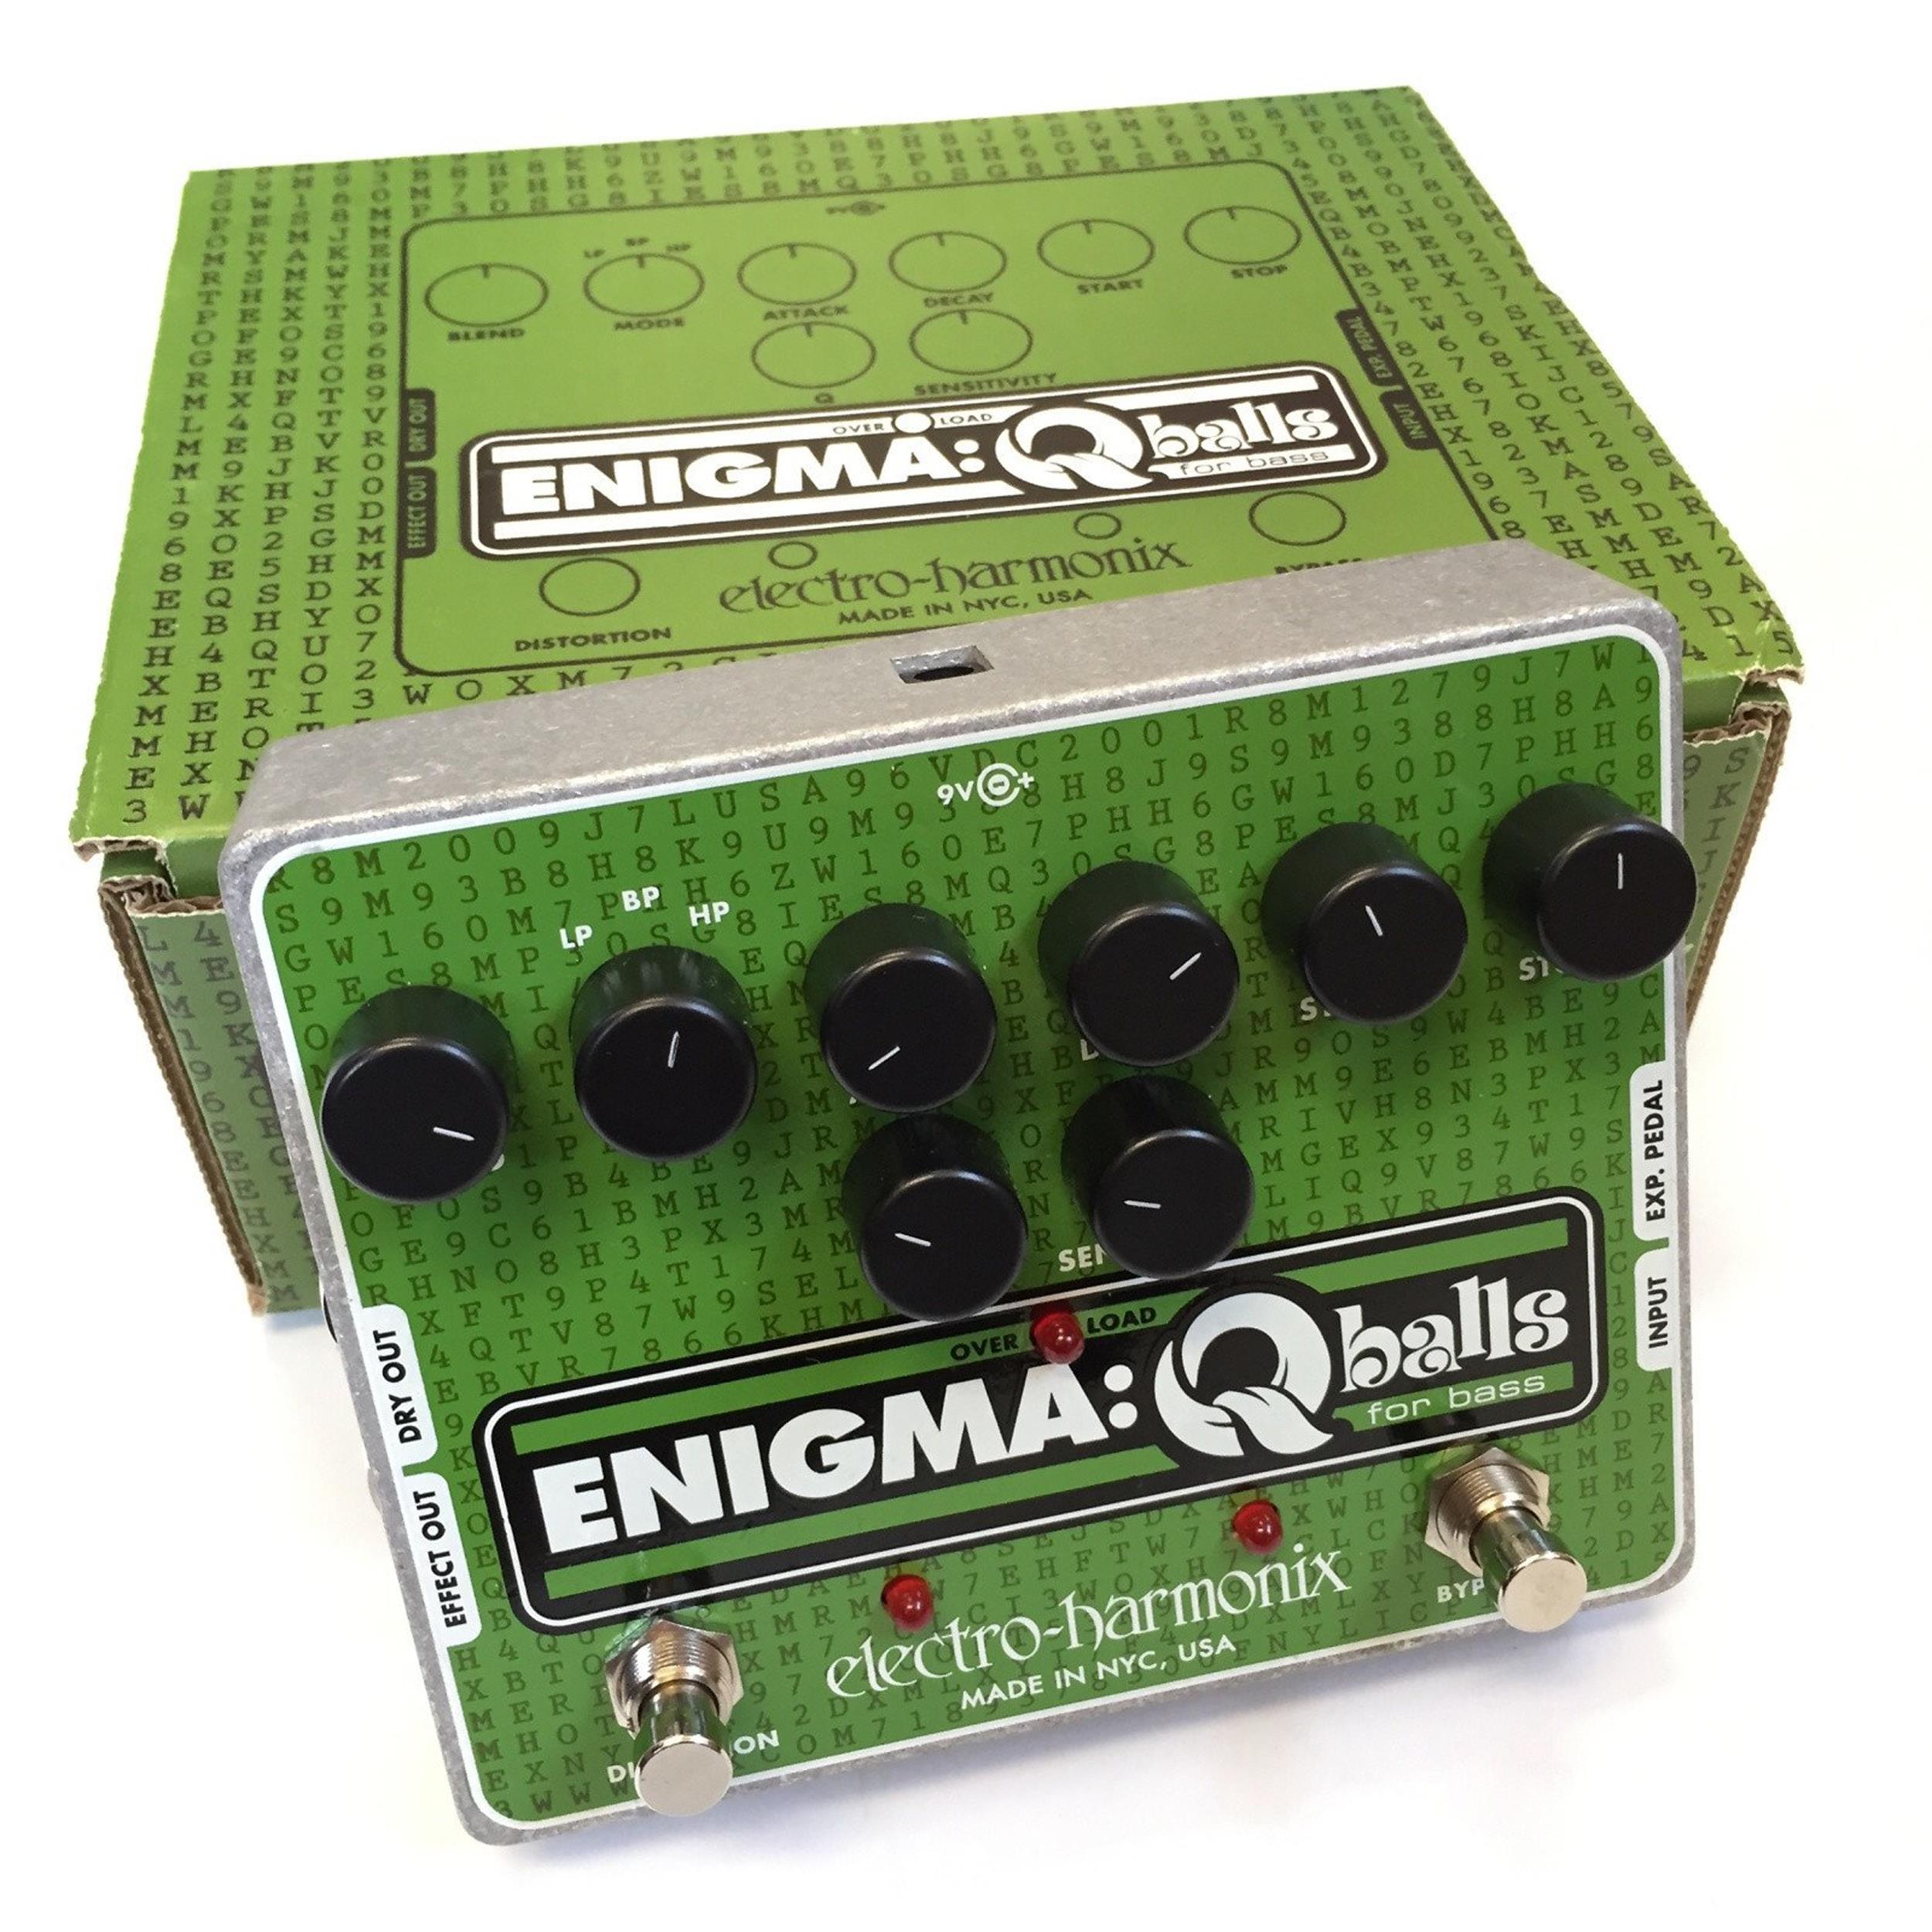 ELECTRO-HARMONIX-ENIGMA-Q-sku-3175